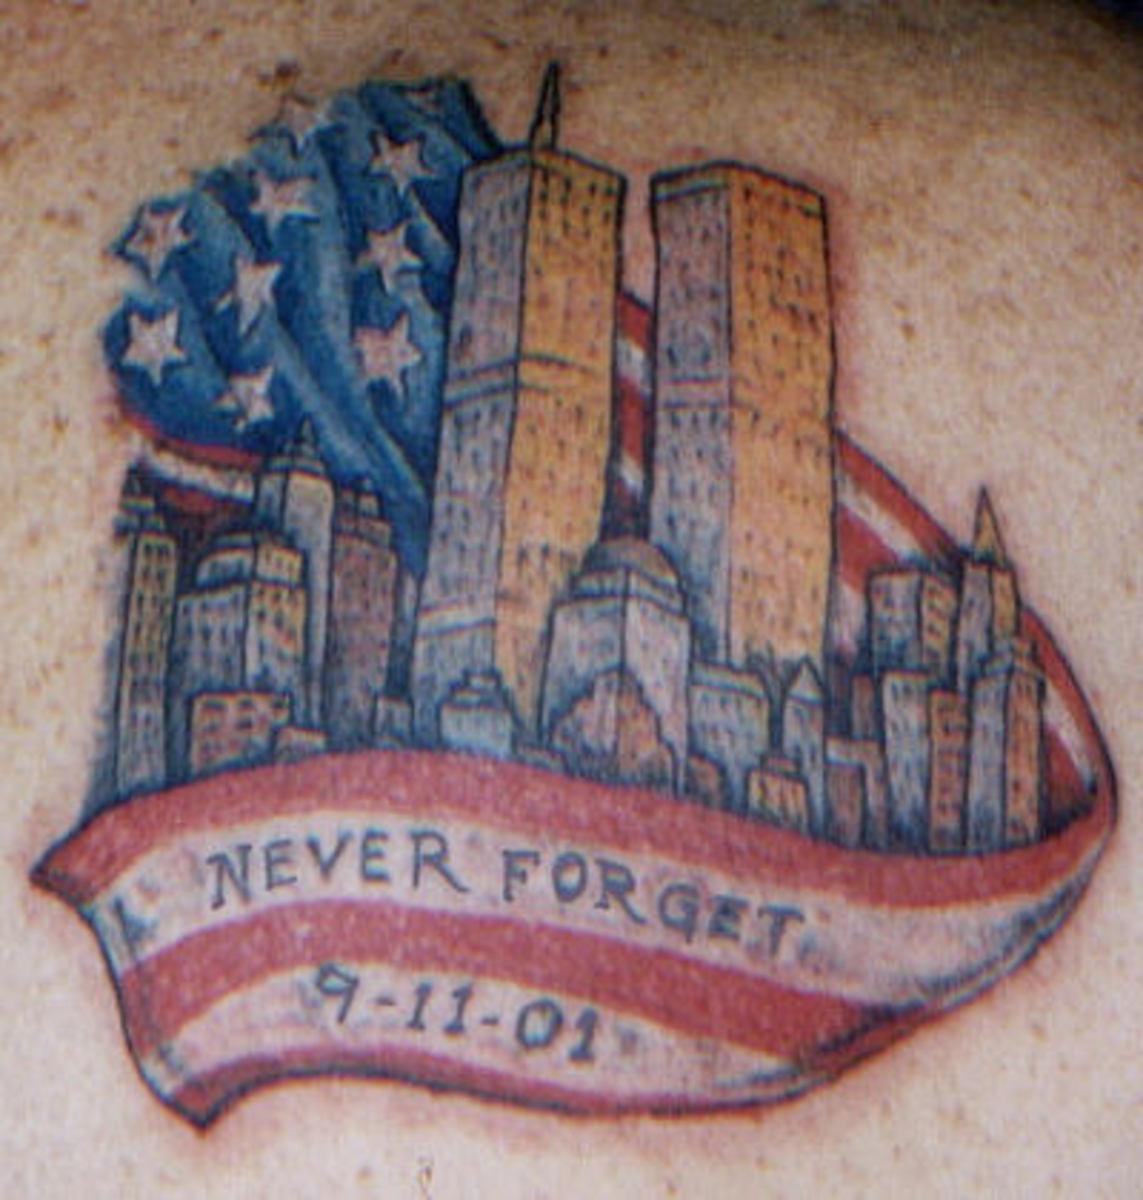 9-11-01 September 11 Memorial Tattoos